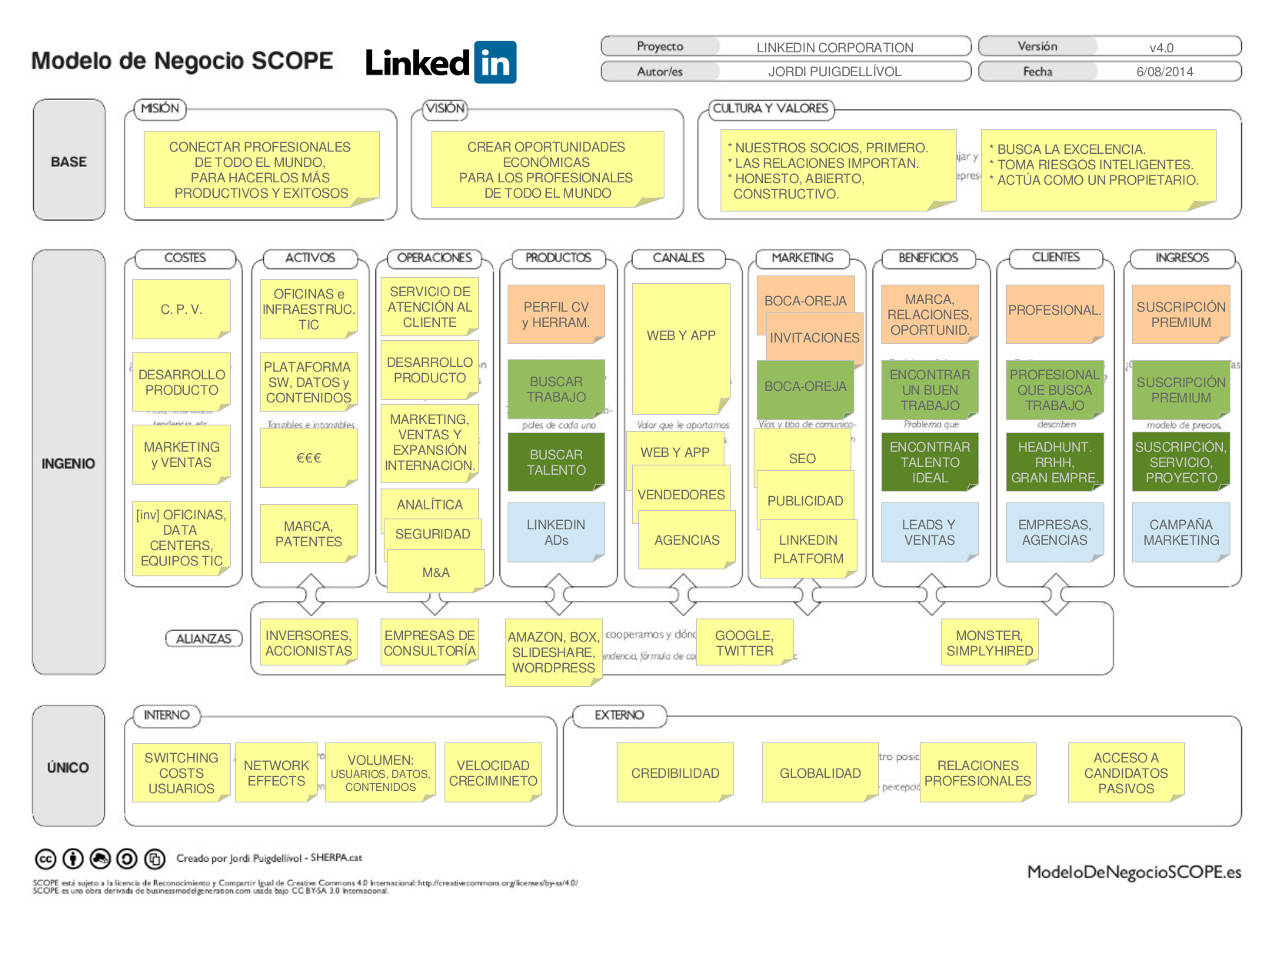 Linkedin - Modelo de Negocio SCOPE